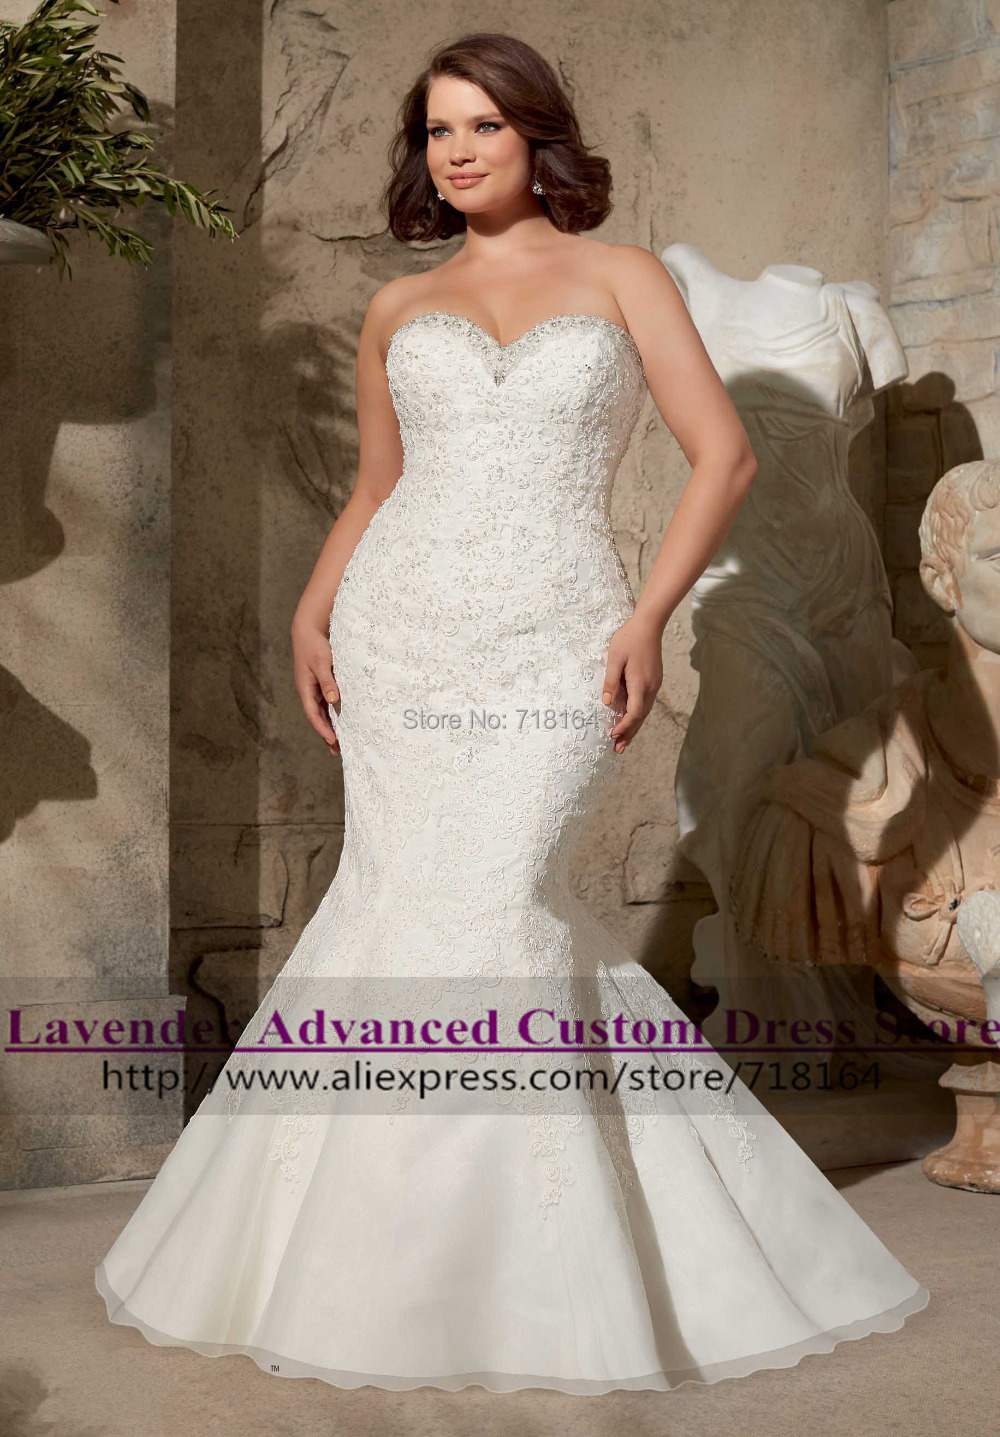 Cheap plus size wedding dresses perth